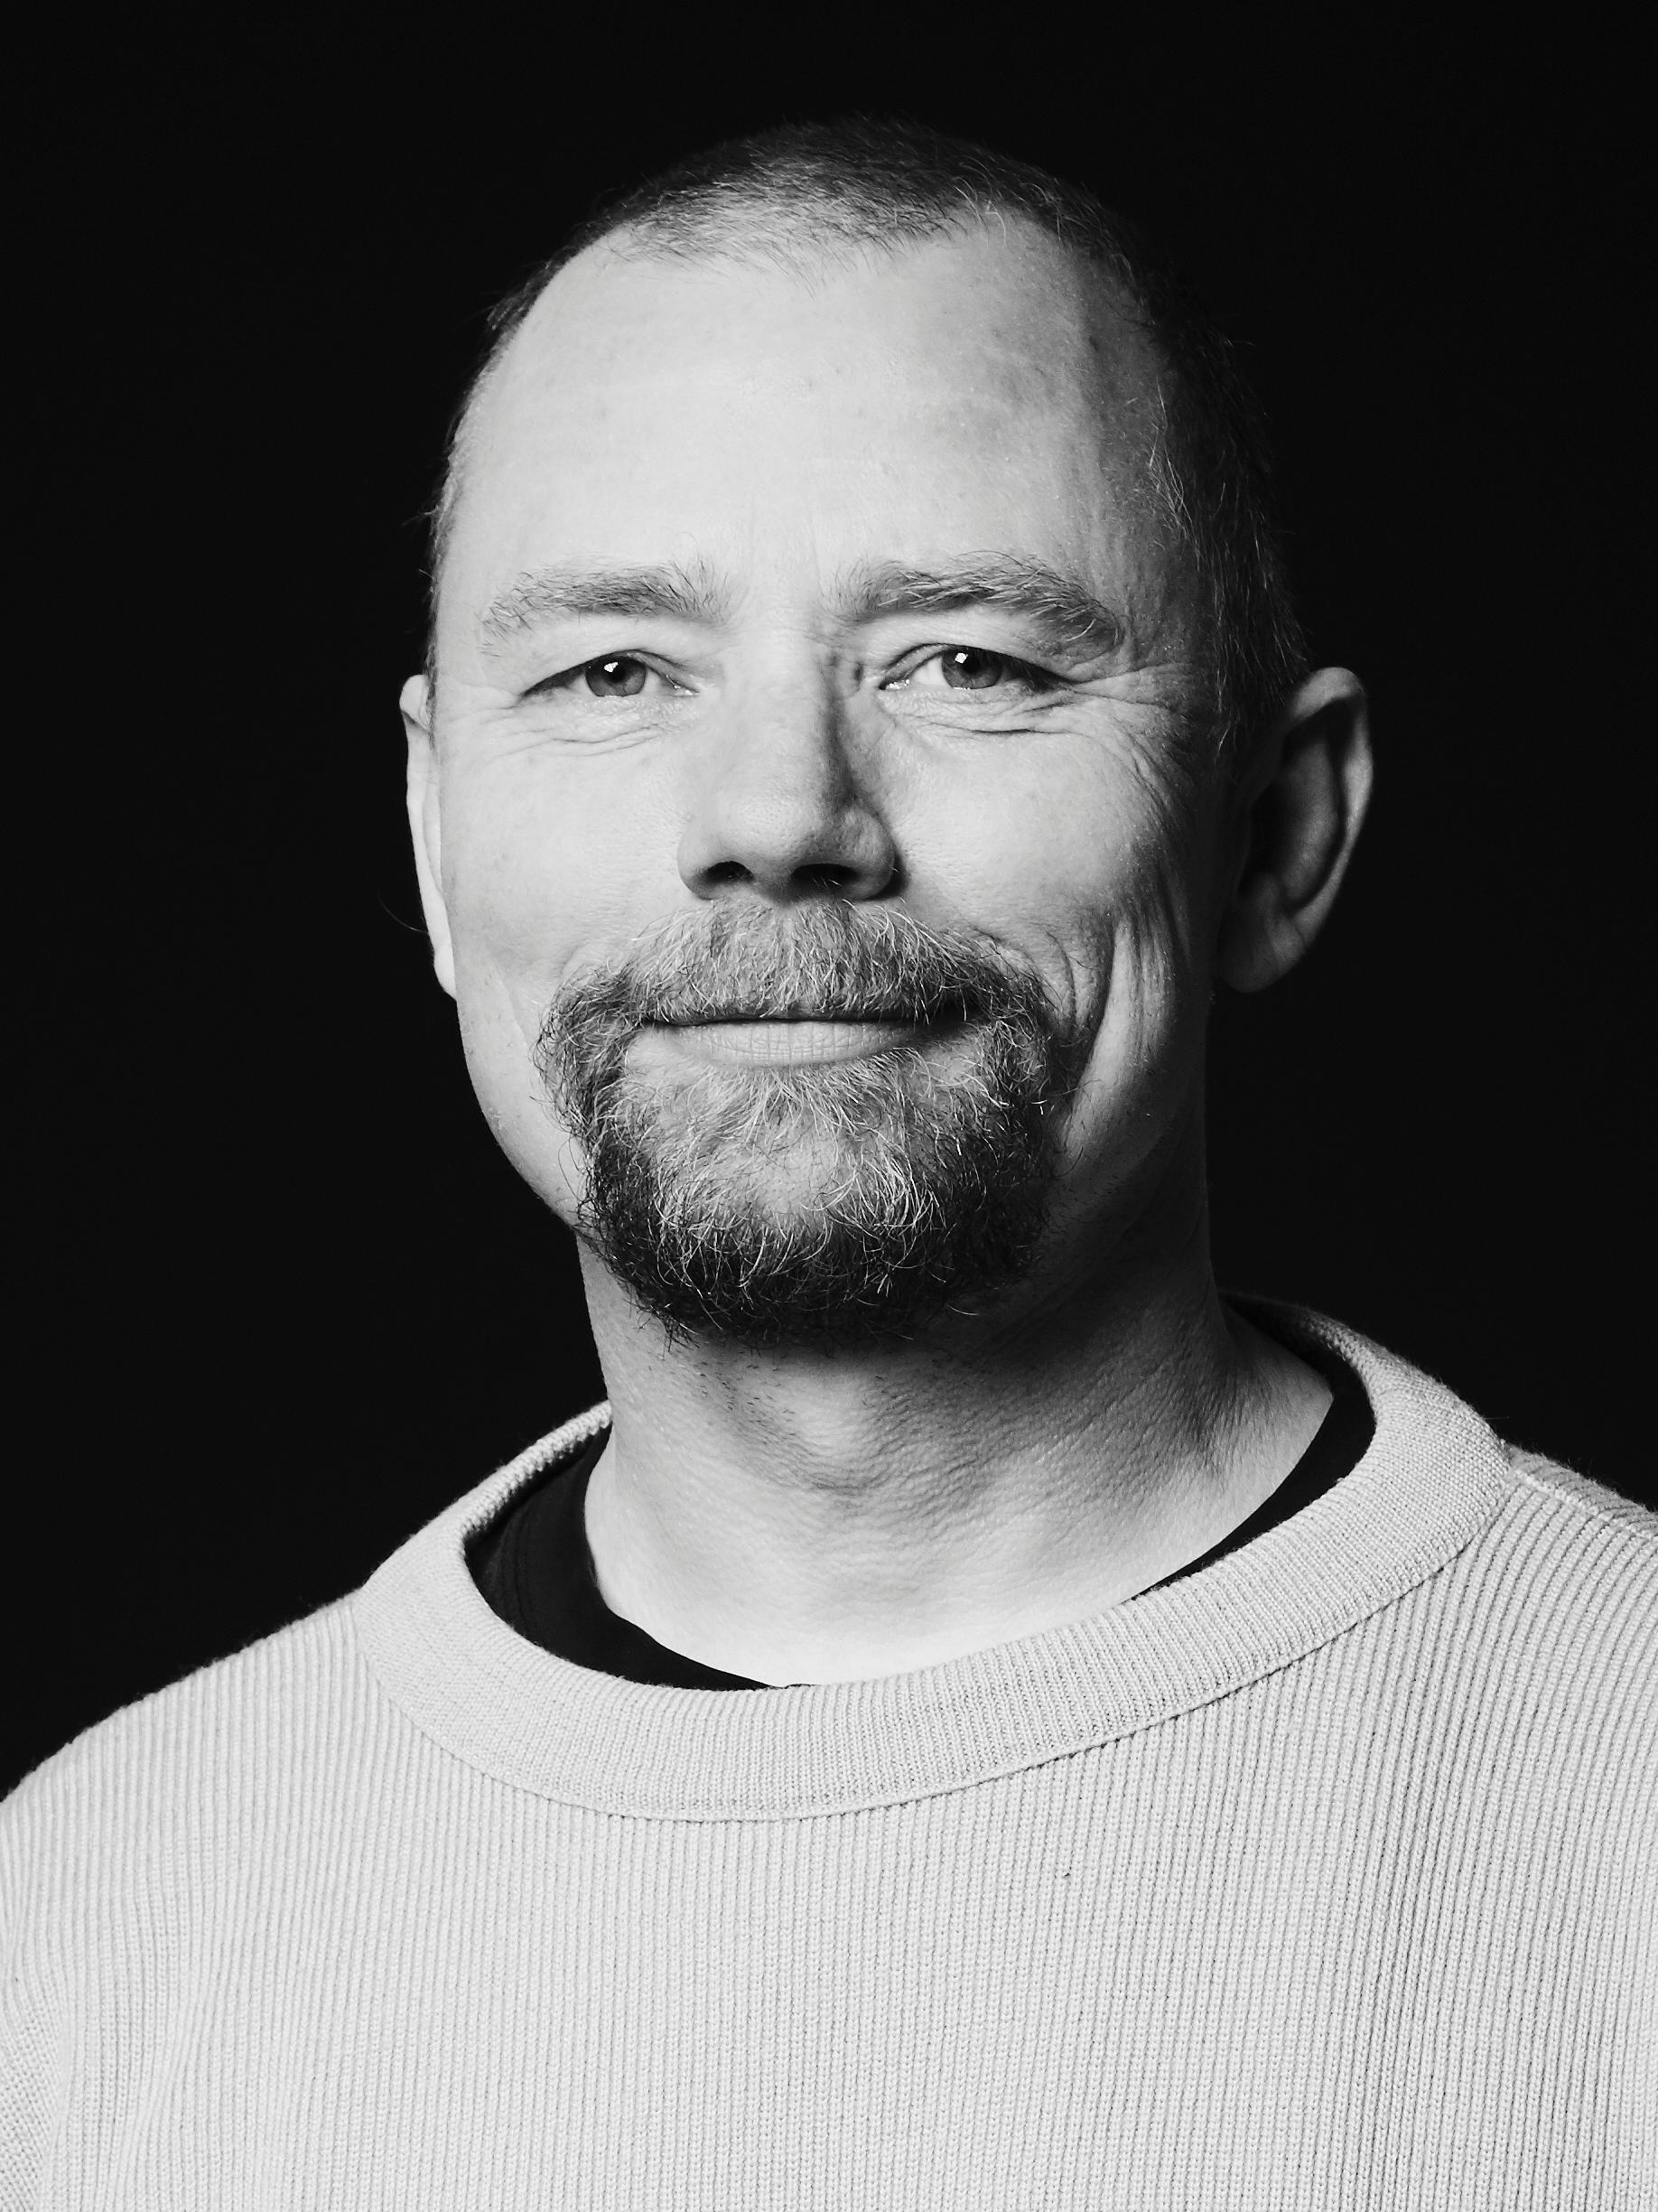 Niels Hannibal